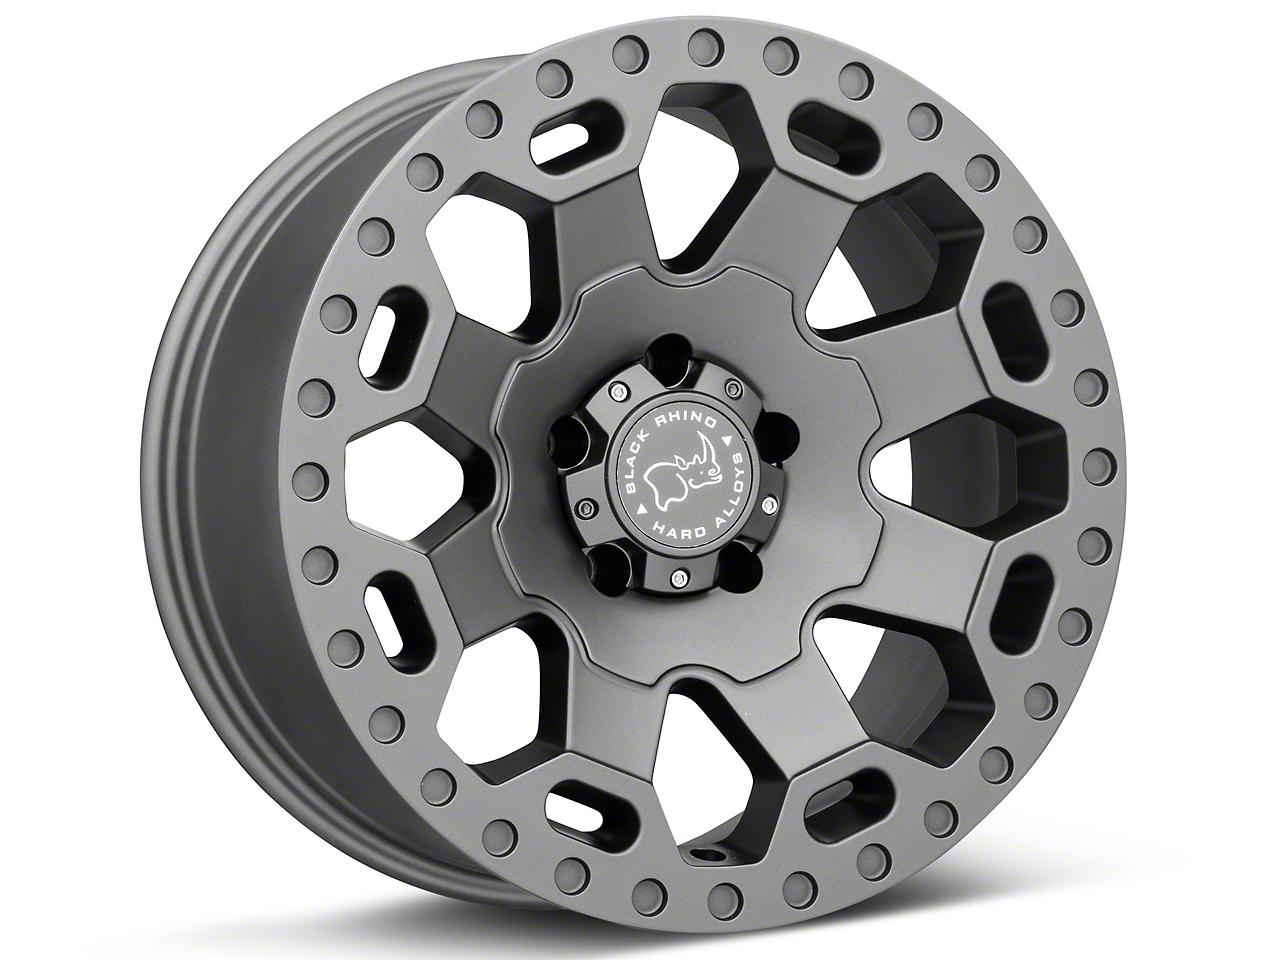 Black Rhino Warlord Matte Gunmetal Wheels (07-18 Wrangler JK; 2018 Wrangler JL)